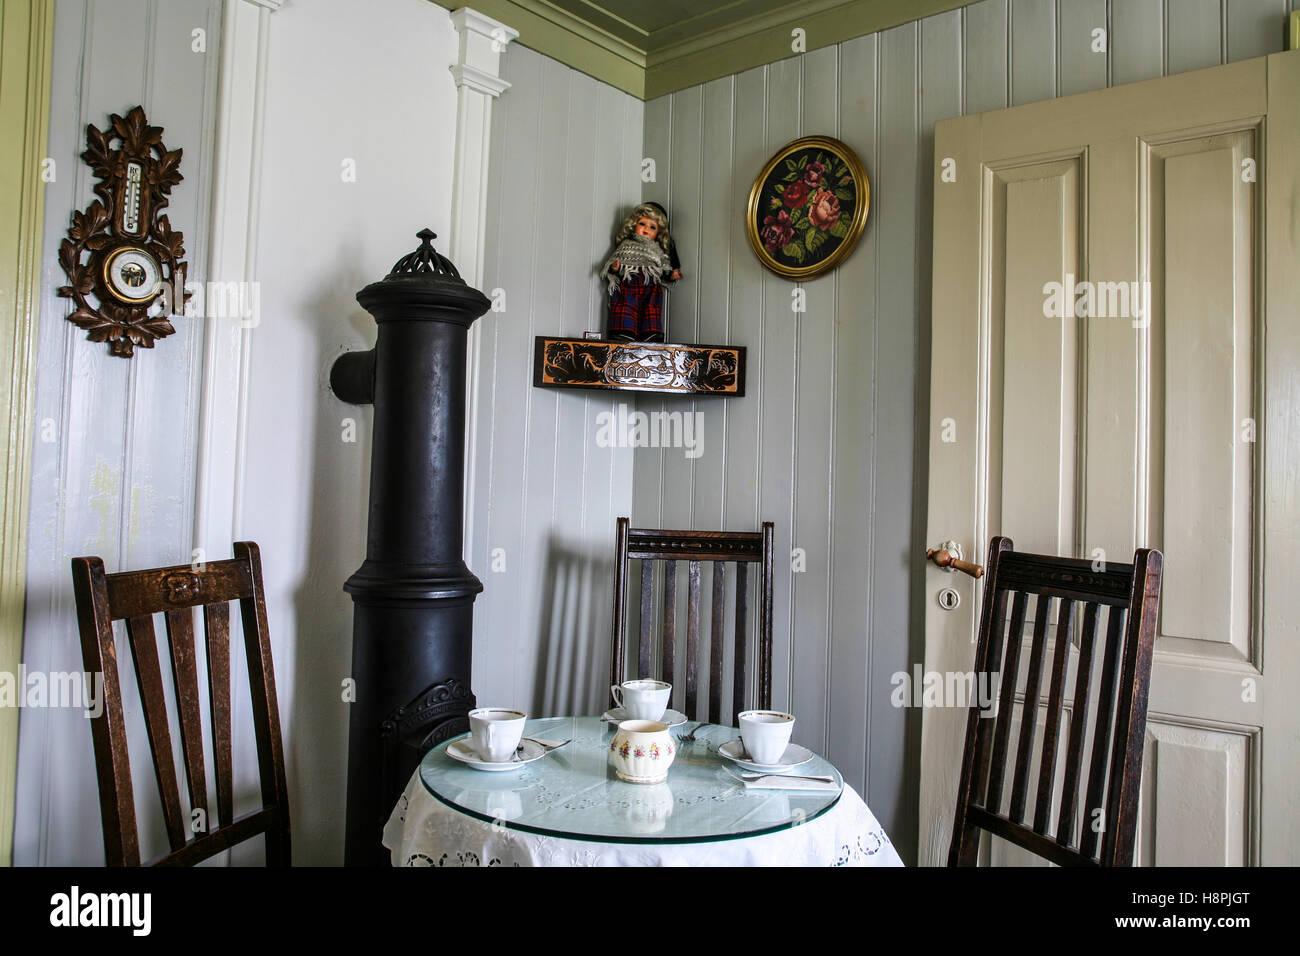 Kuche Vintage Style Wallpaper Rasch Deco Style Vintage Diner Grey